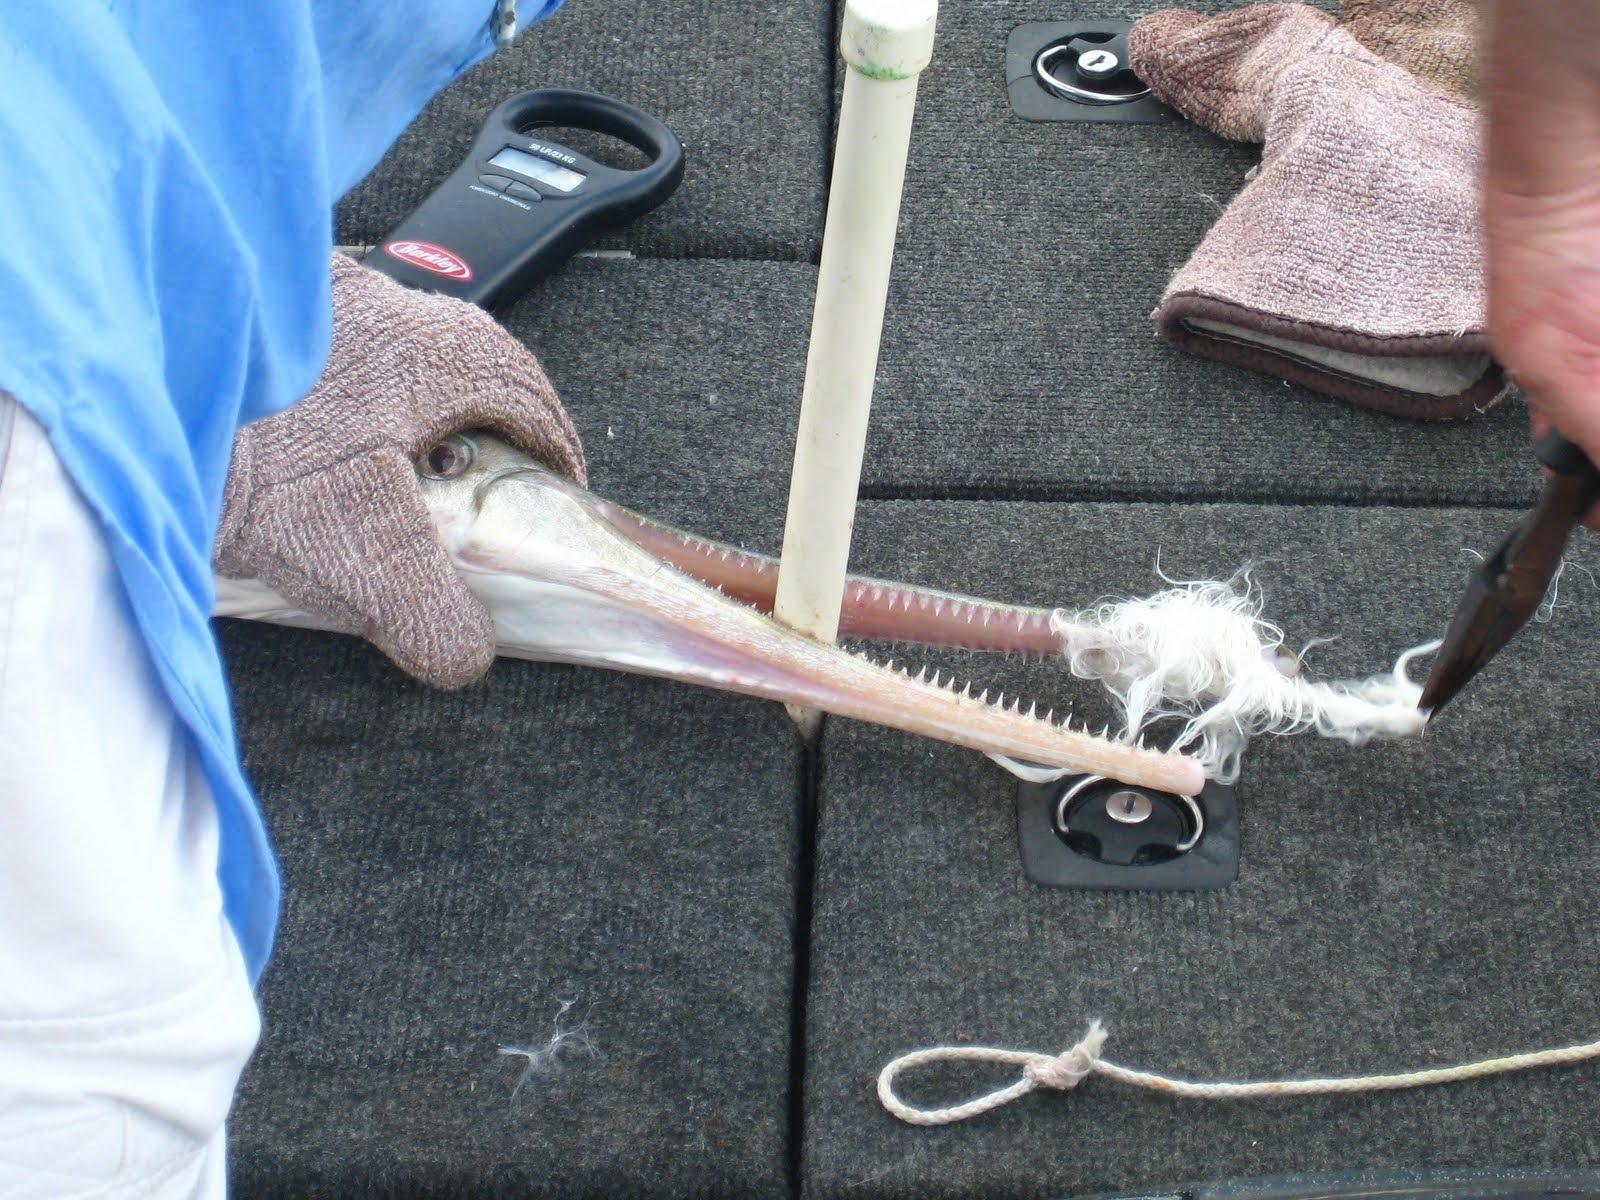 18lbs-1oz 53.5 inches 5-18-10 Nylon Rope Lure.jpg